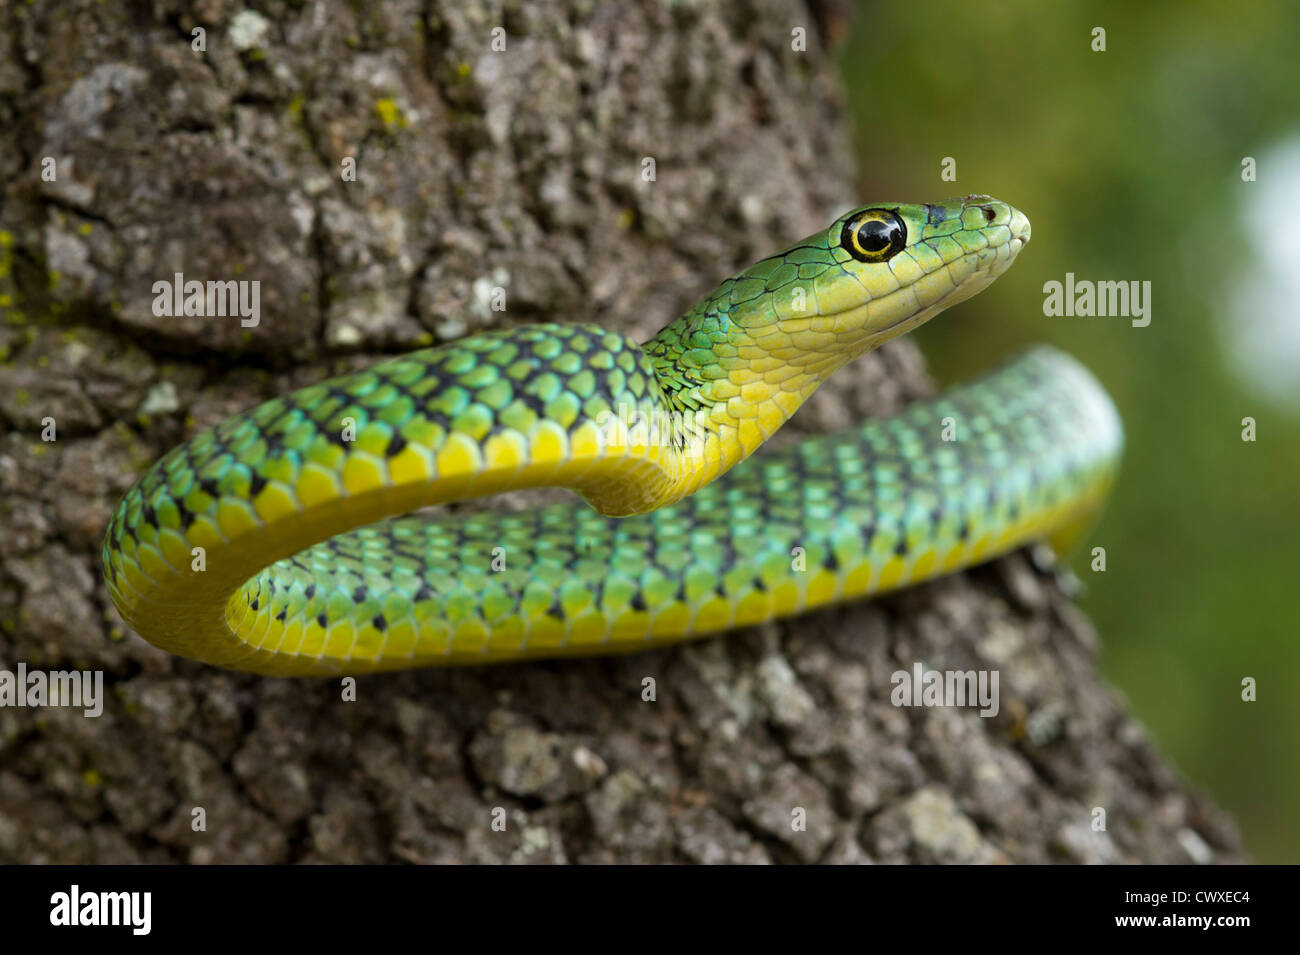 Avvistato bush snake, Philothamnus semivariegatus, Akagera National Park, Ruanda Immagini Stock